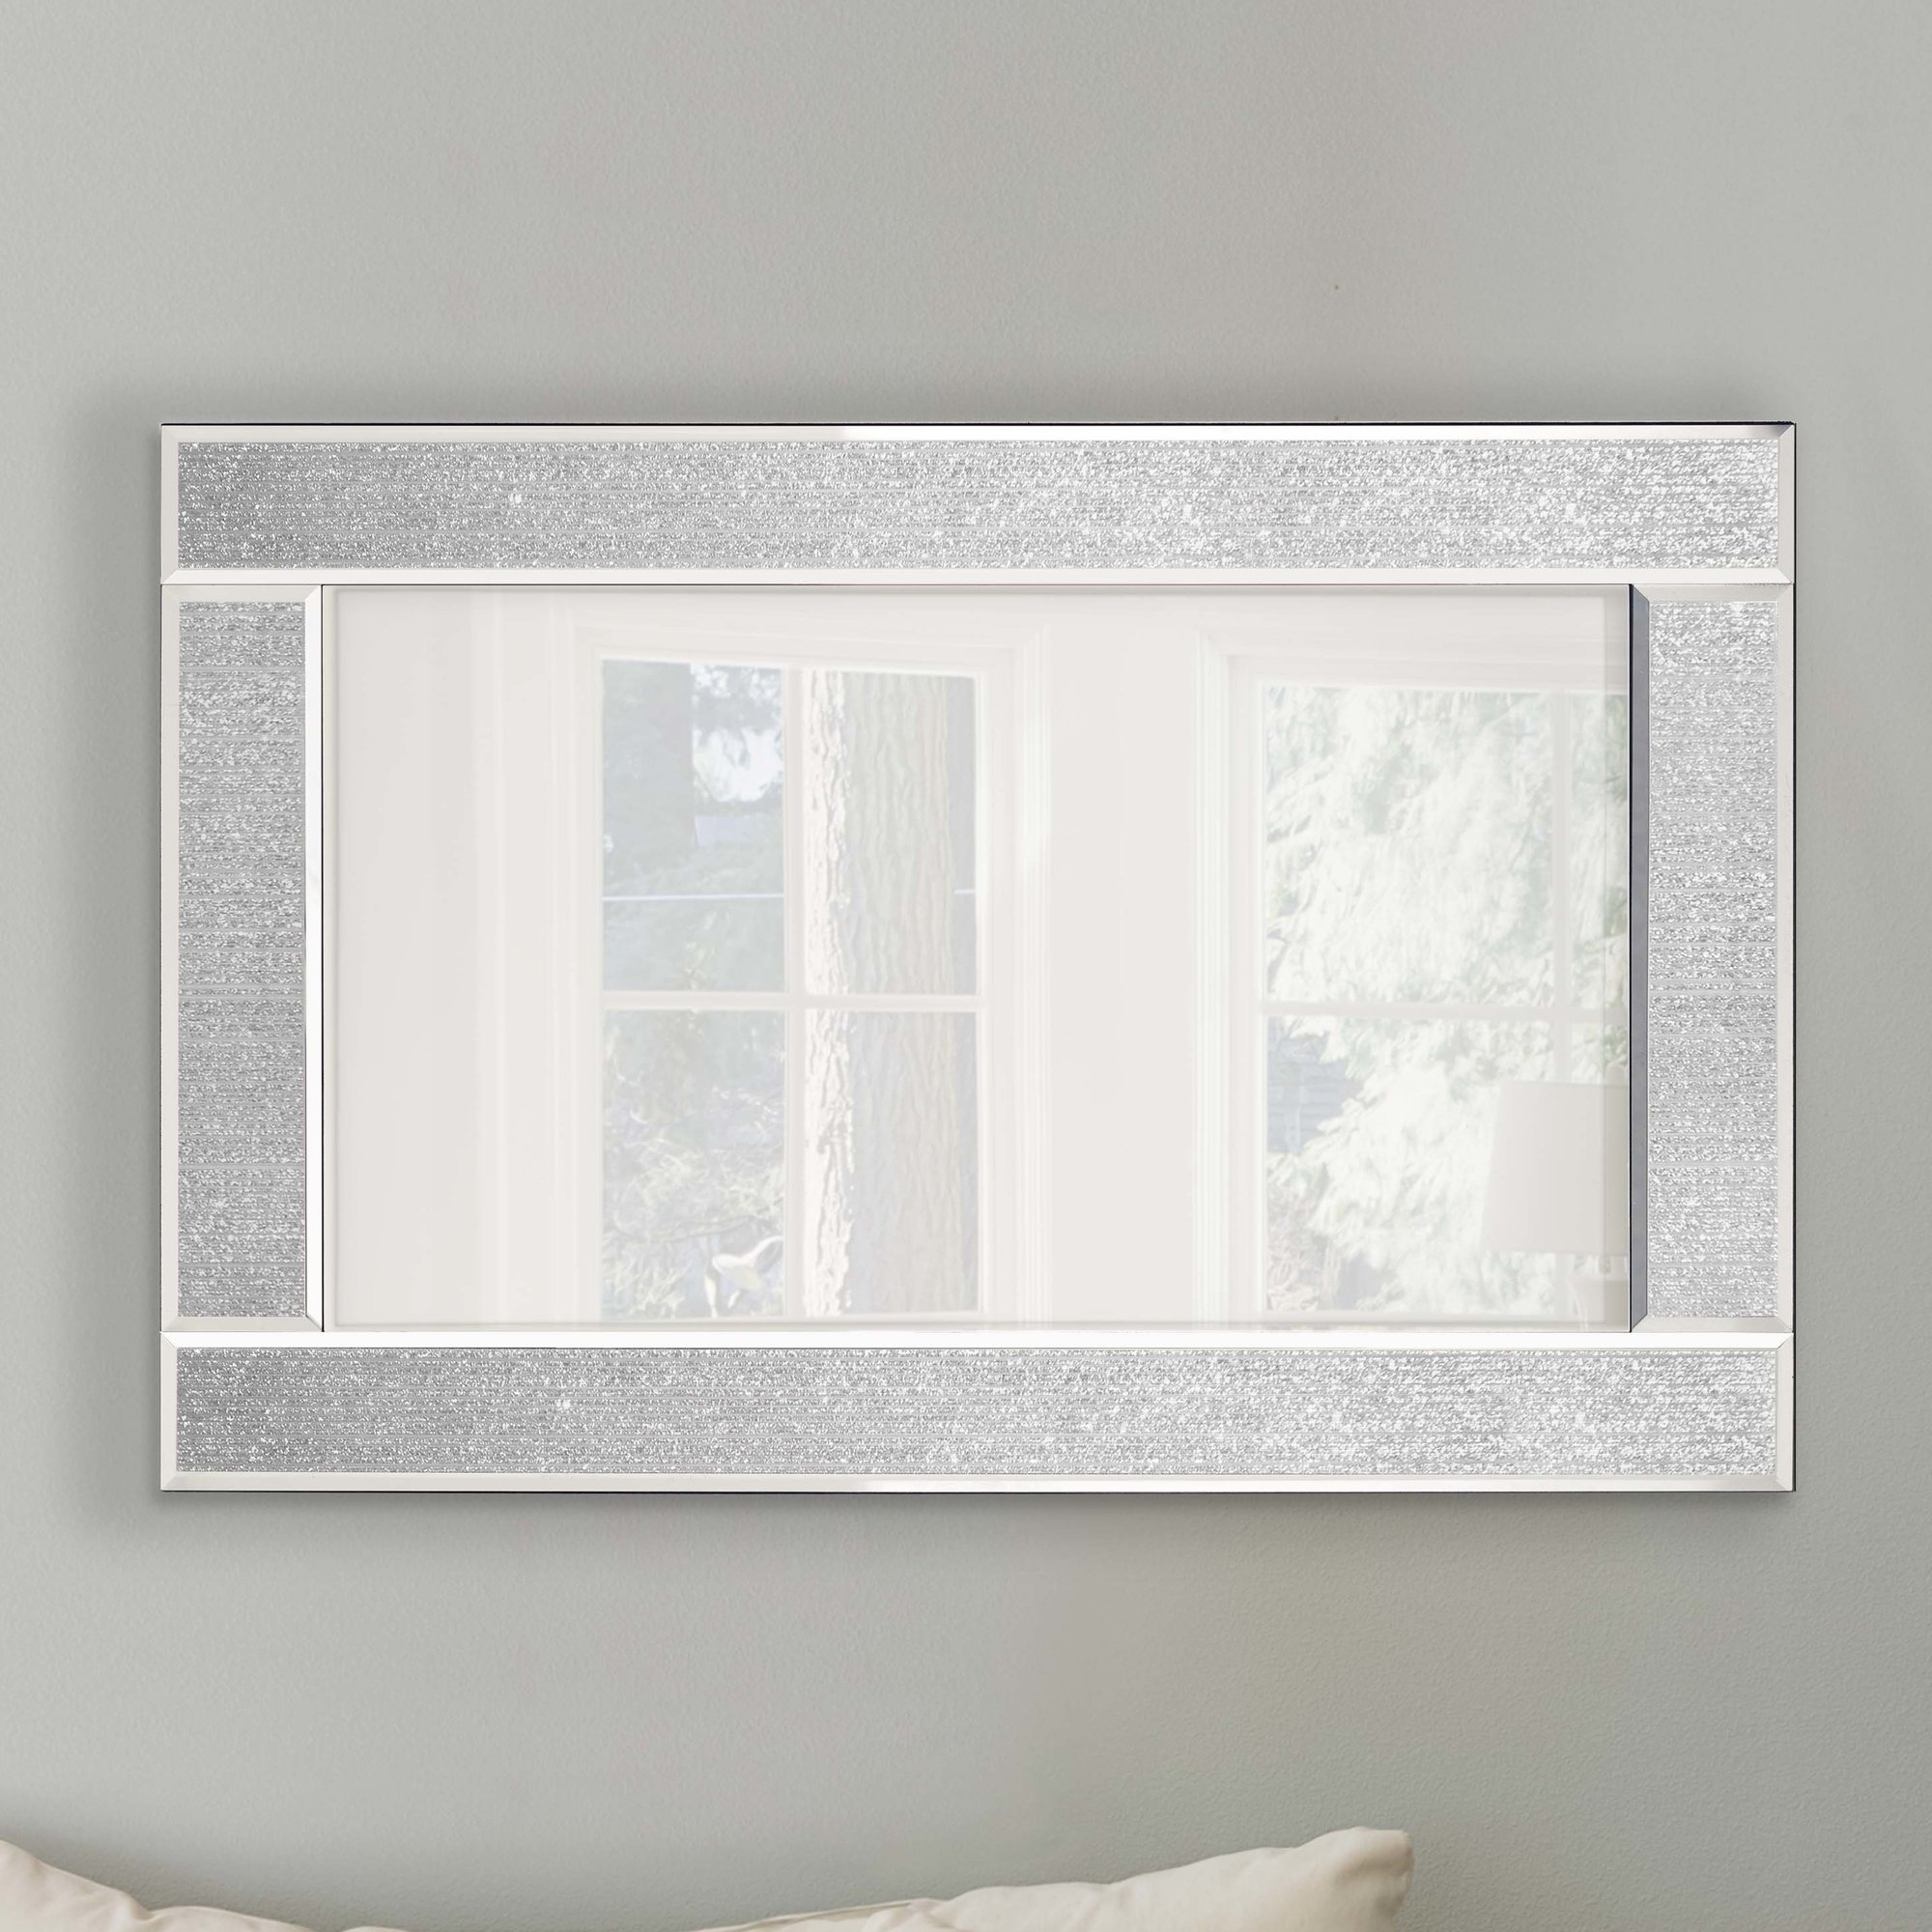 Innova Glitter Ascot Mirror Reviews Wayfaircouk Inside Silver Glitter Mirror (Image 9 of 15)